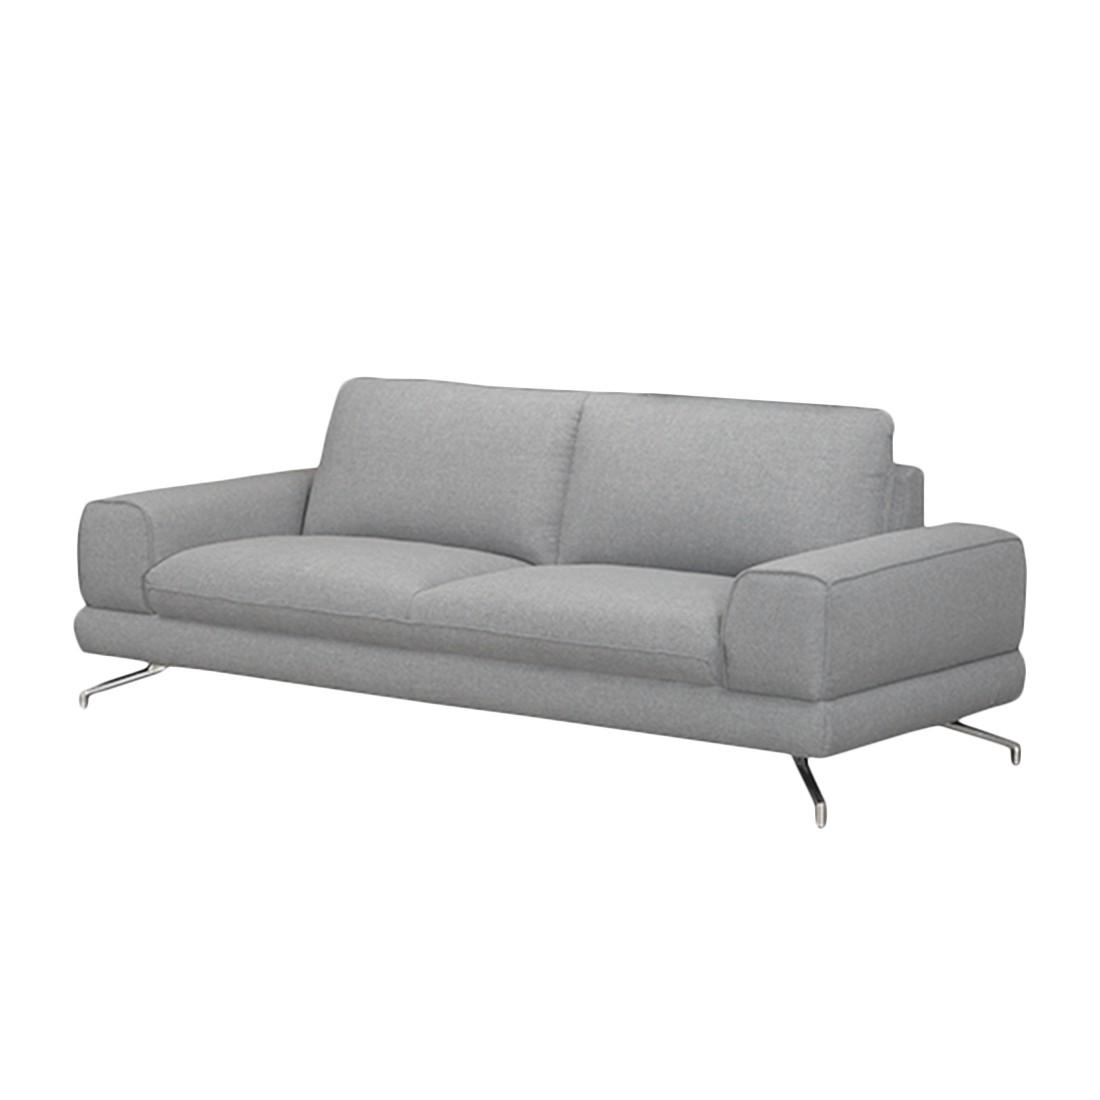 Sofa Lennard (2,5-Sitzer) – Webstoff Grau – Mit 1 Kopfstütze, loftscape günstig bestellen